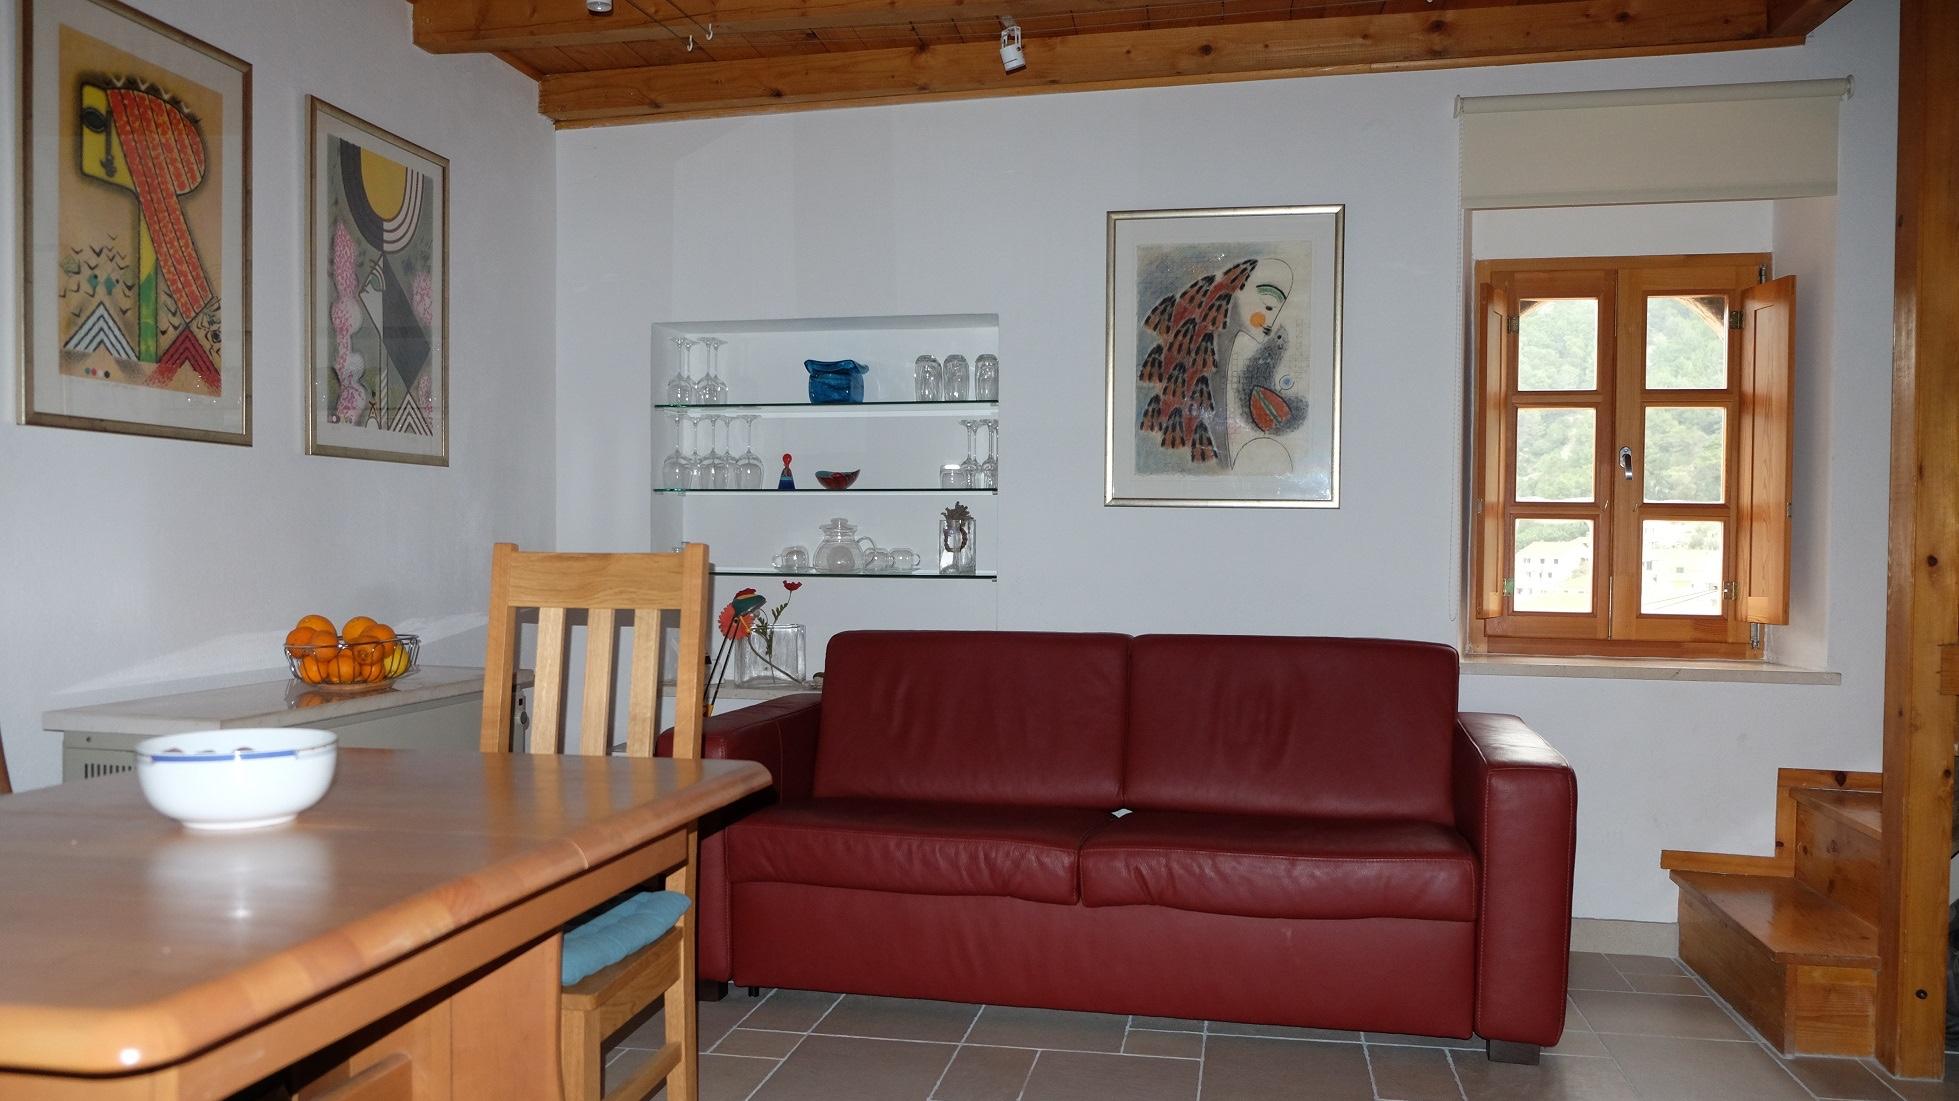 Property for sale in Hvar town centre